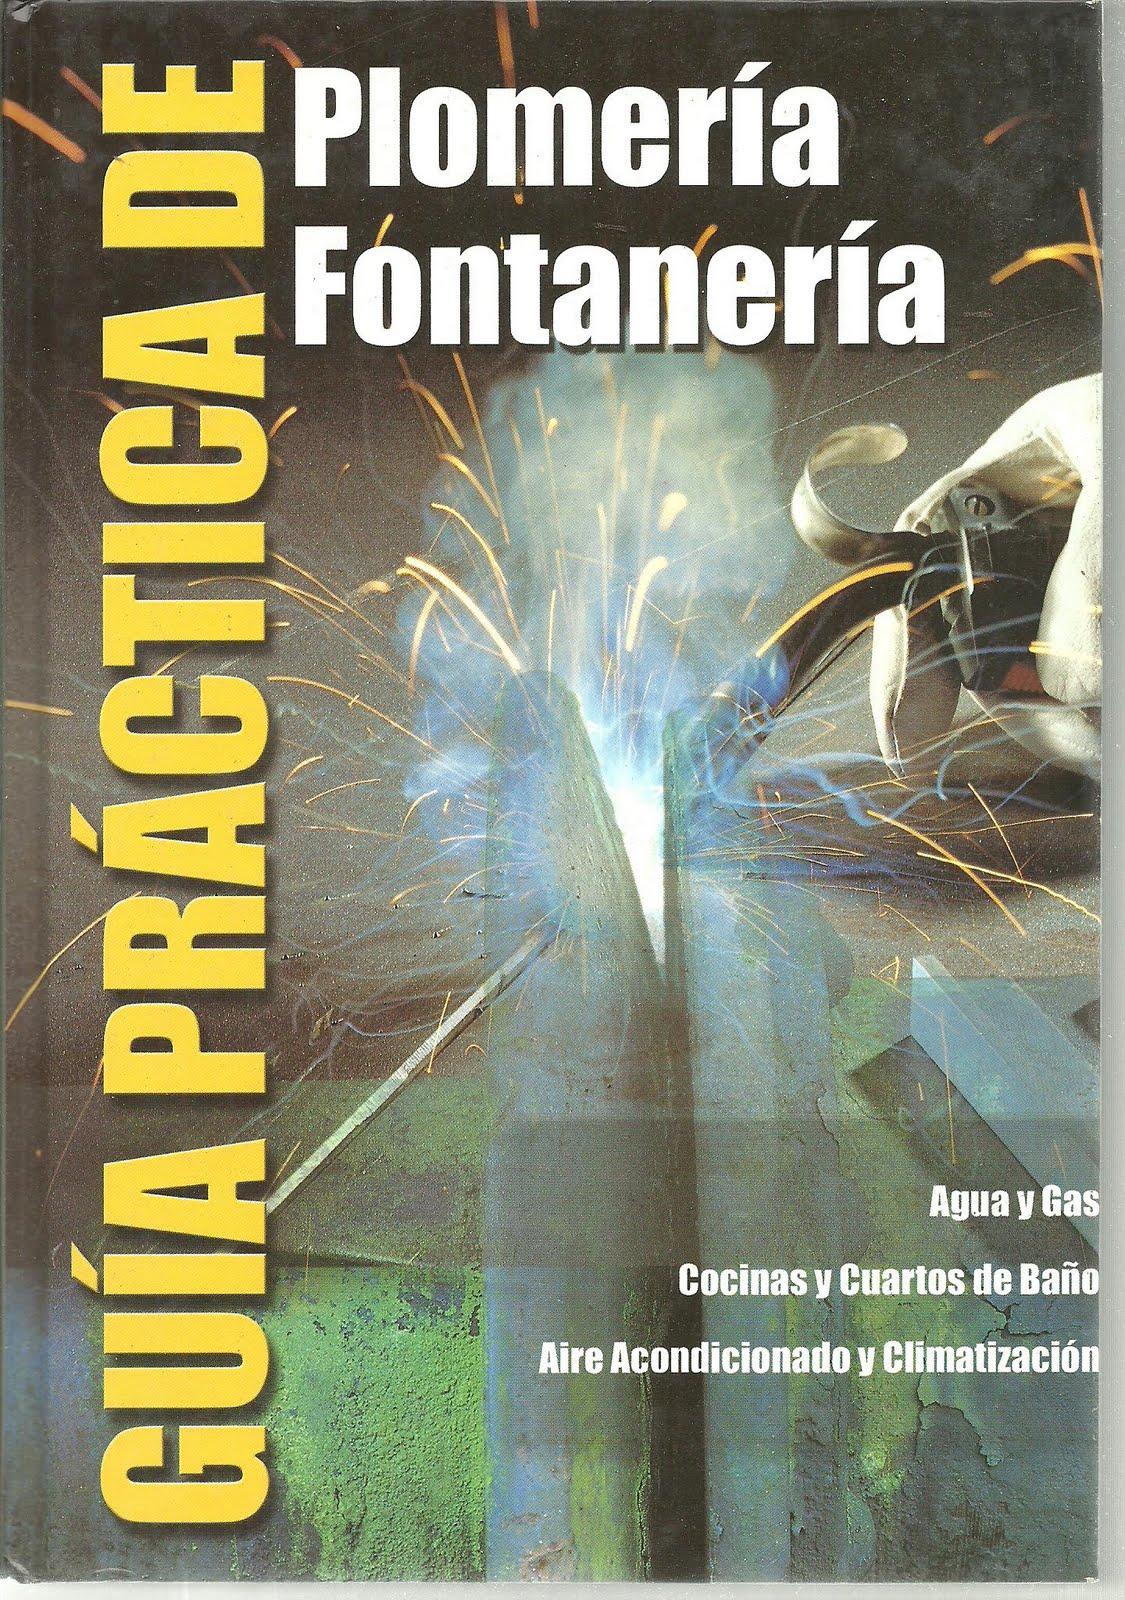 Fontaneria Baño Nuevo: PREPARATORIA PROFESIONAL: LIBRO : GUIA PRACTICA PLOMERIA FONTANERIA